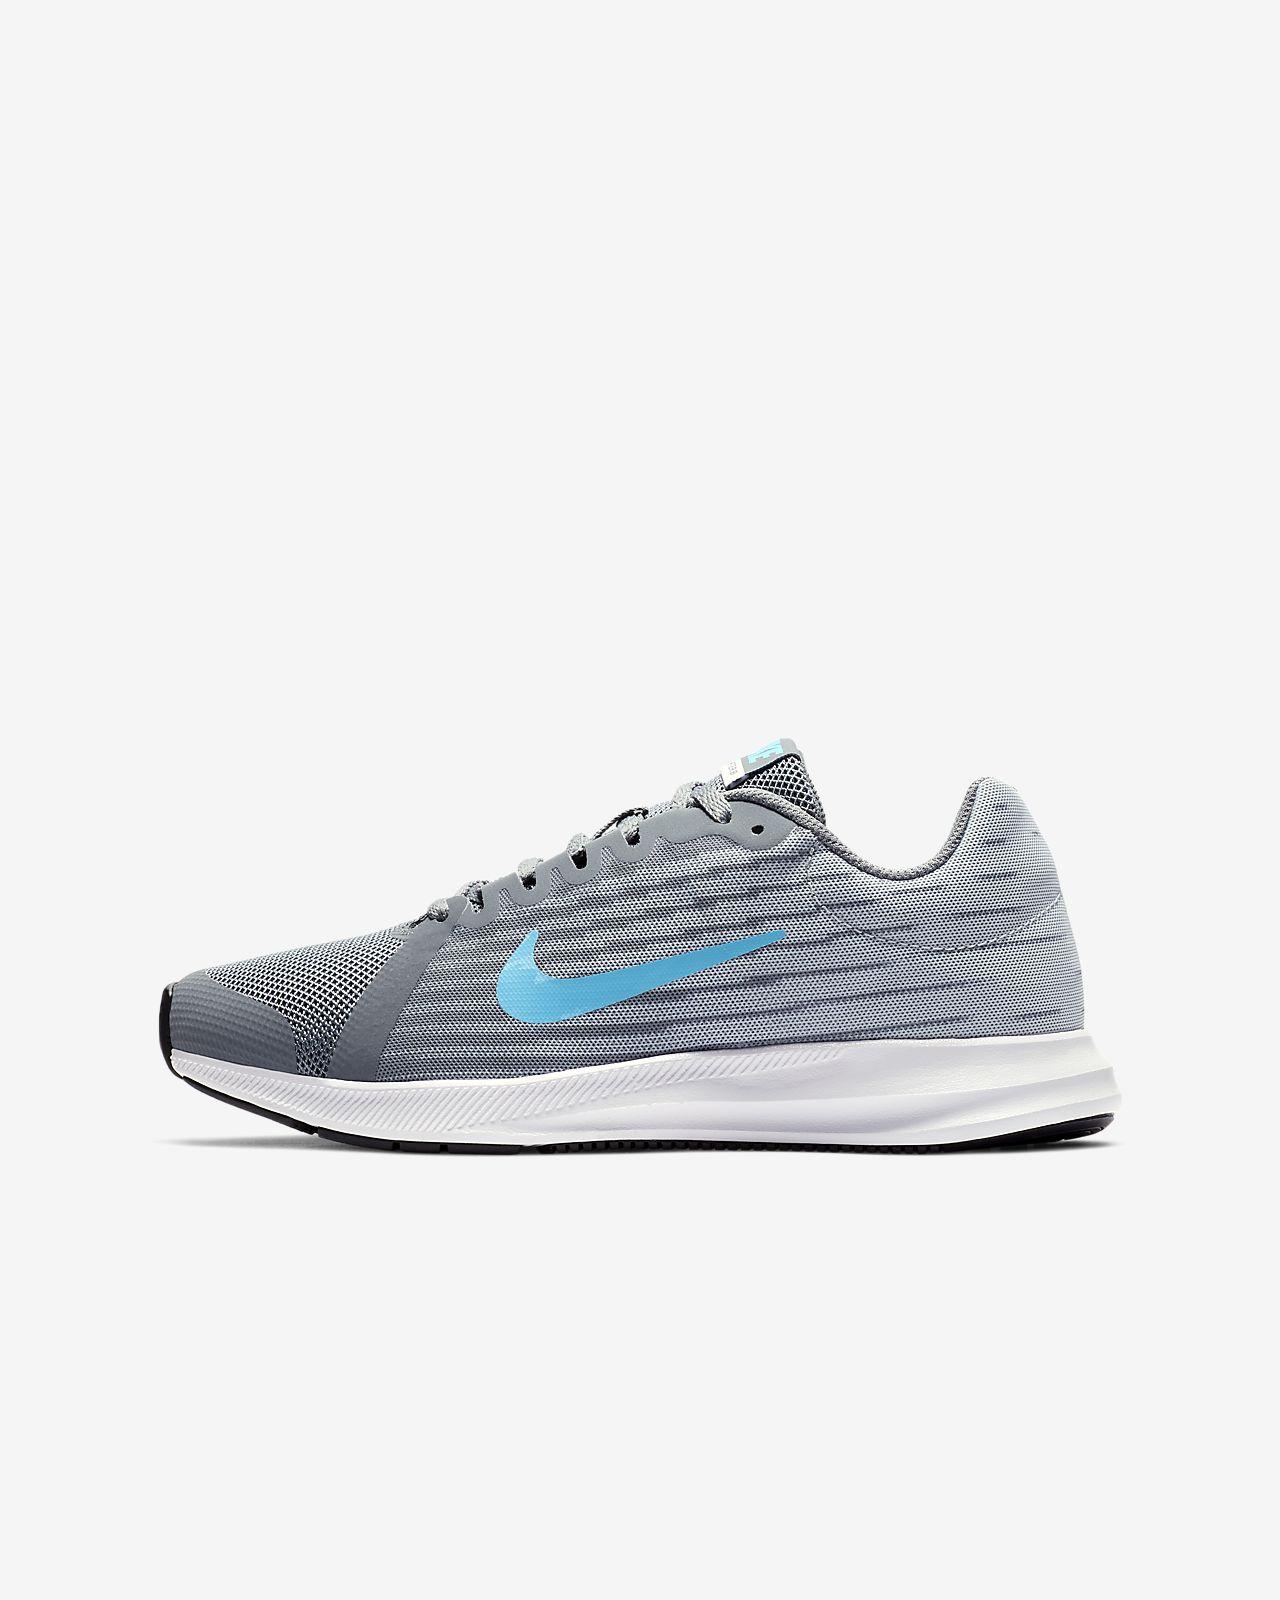 Nike Downshifter 8 Laufschuh für ältere Kinder (Jungen)